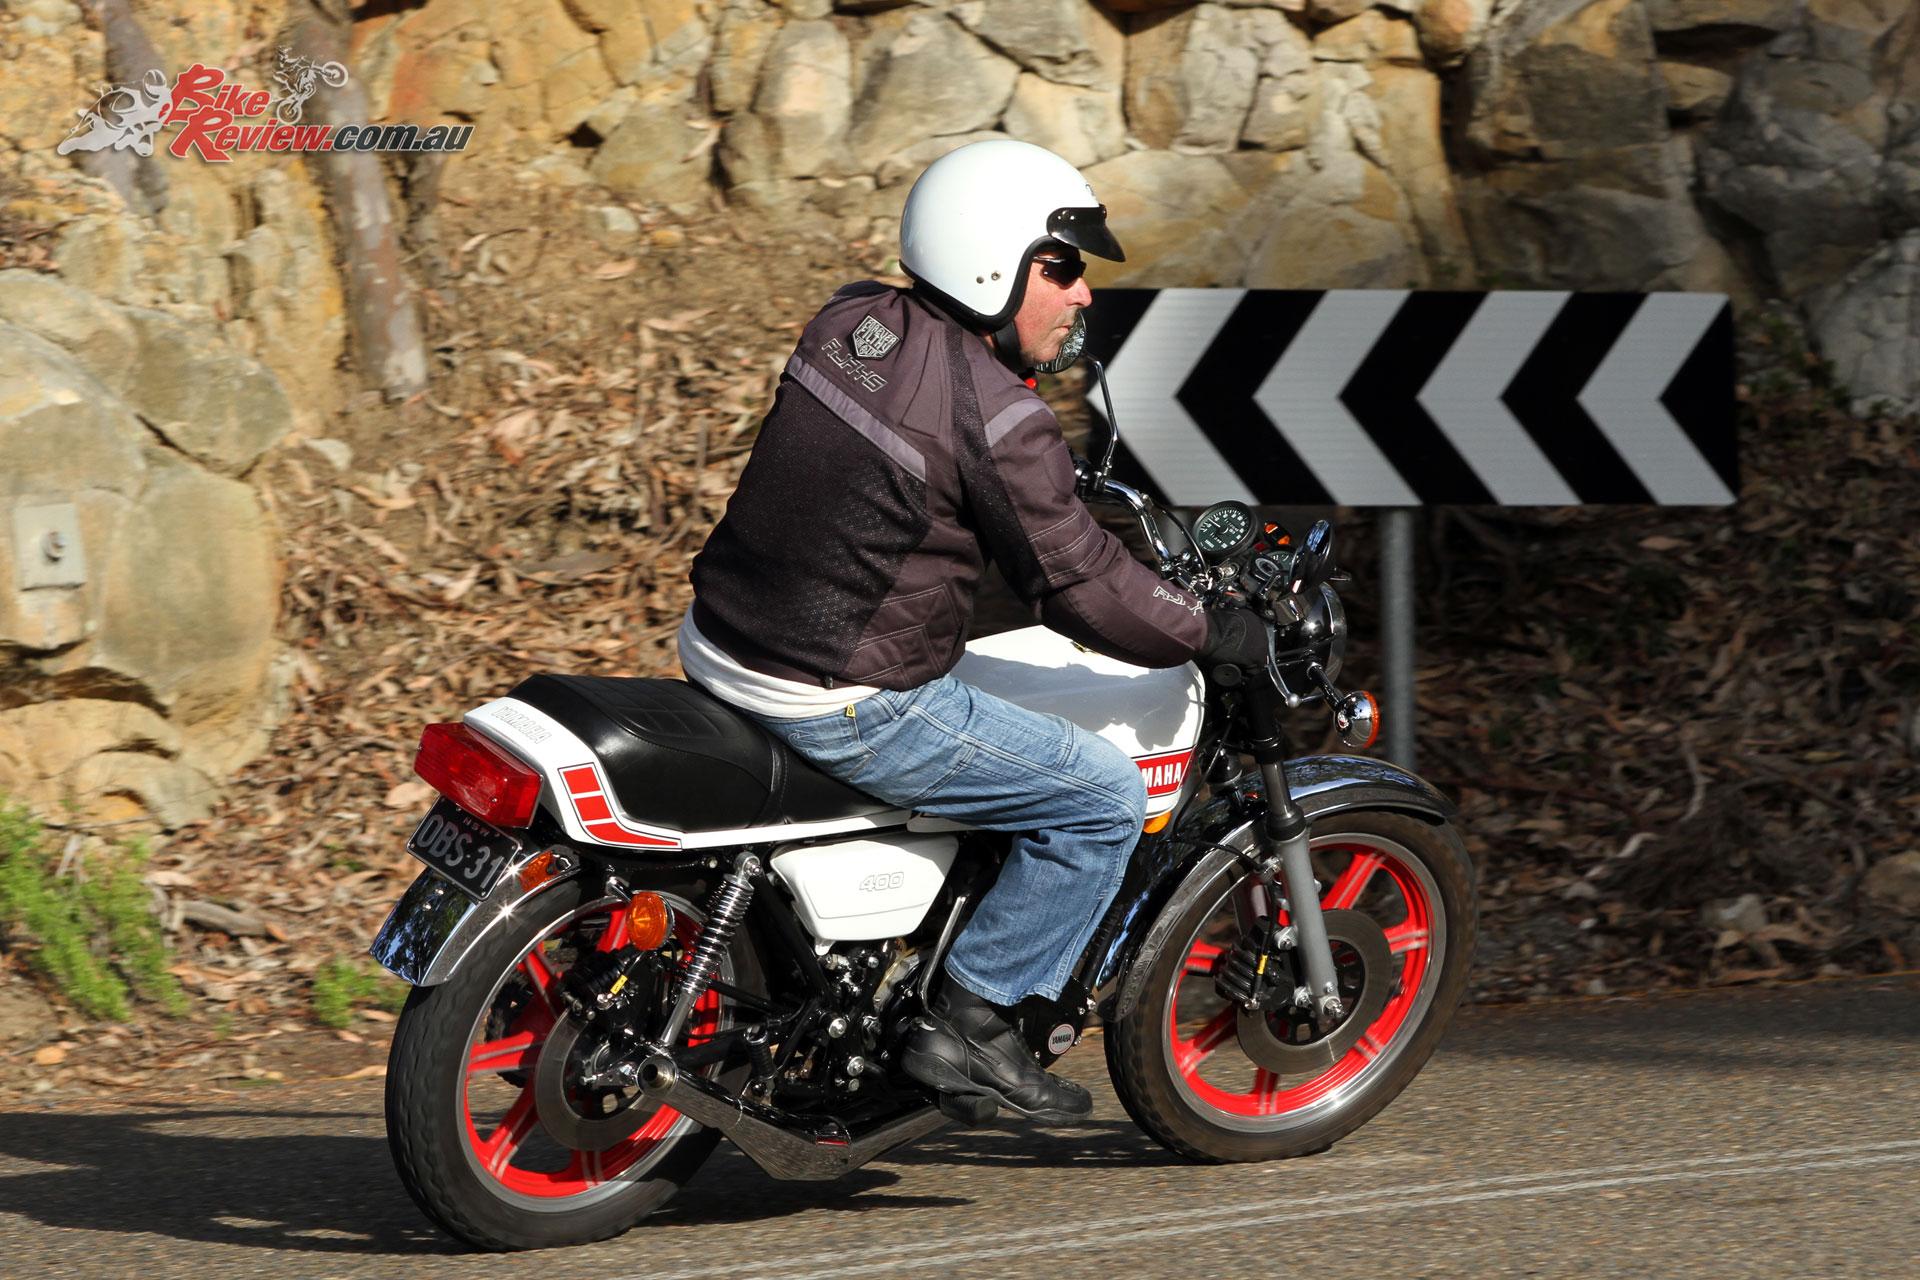 Classic Ride Video: 1980 Yamaha RD400 - Bike Review